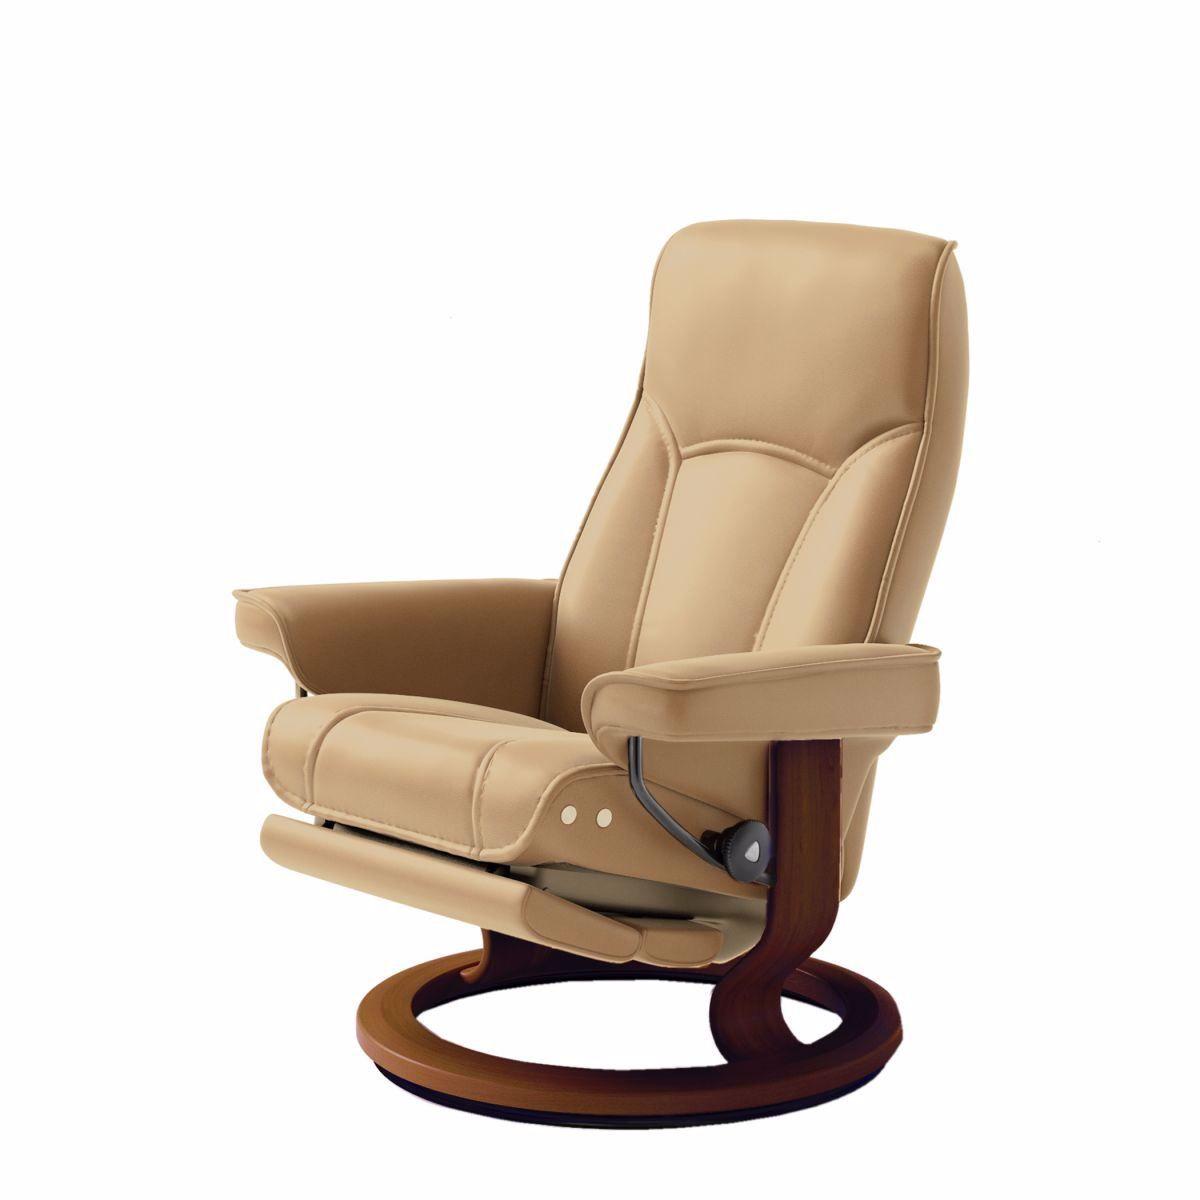 Stressless Senator Classic Chair With Leg Comfort Inspiration